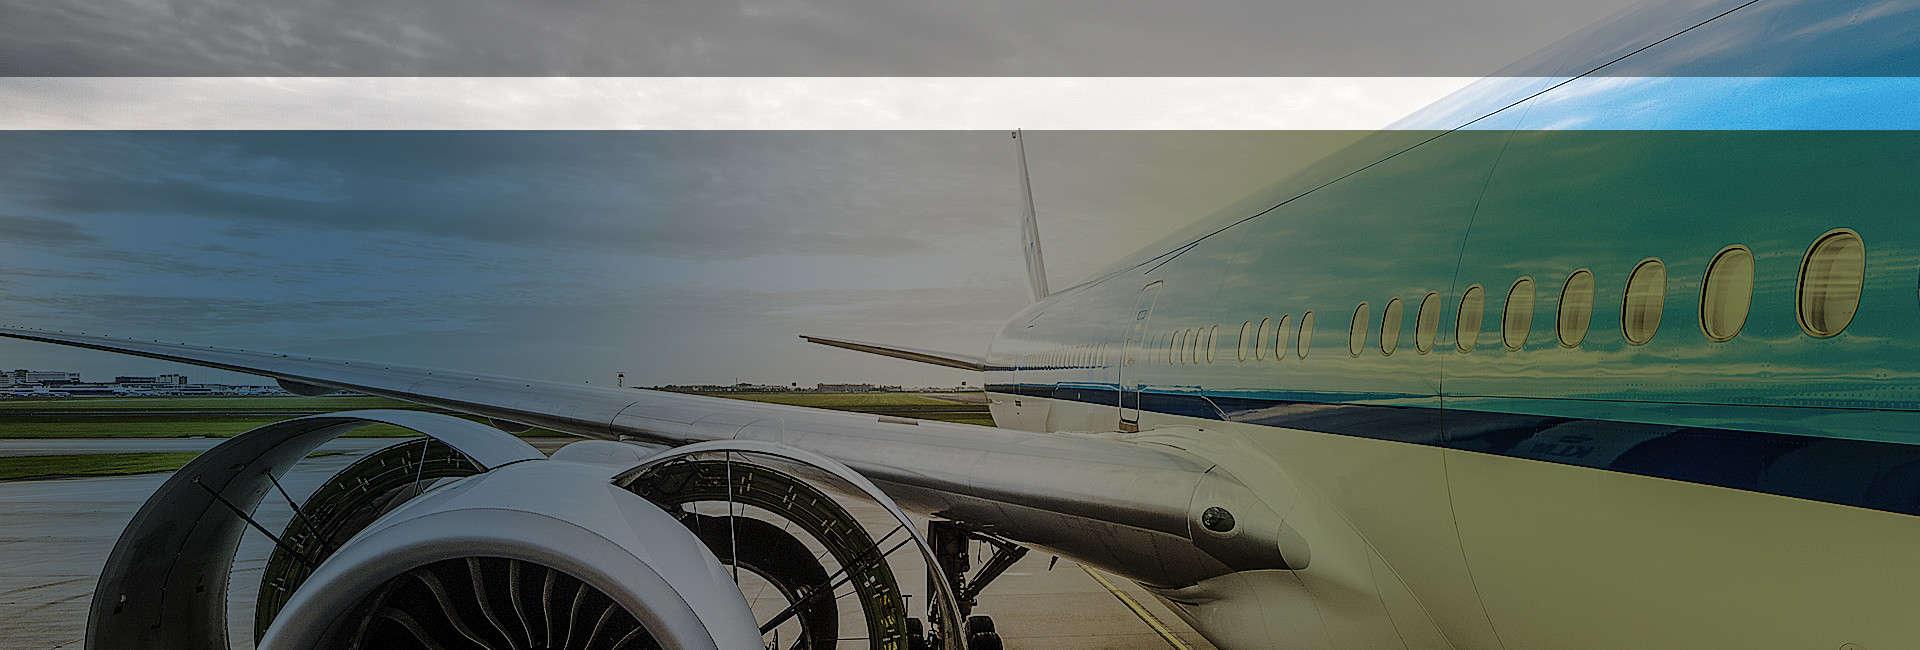 Aerospace in the Cloud